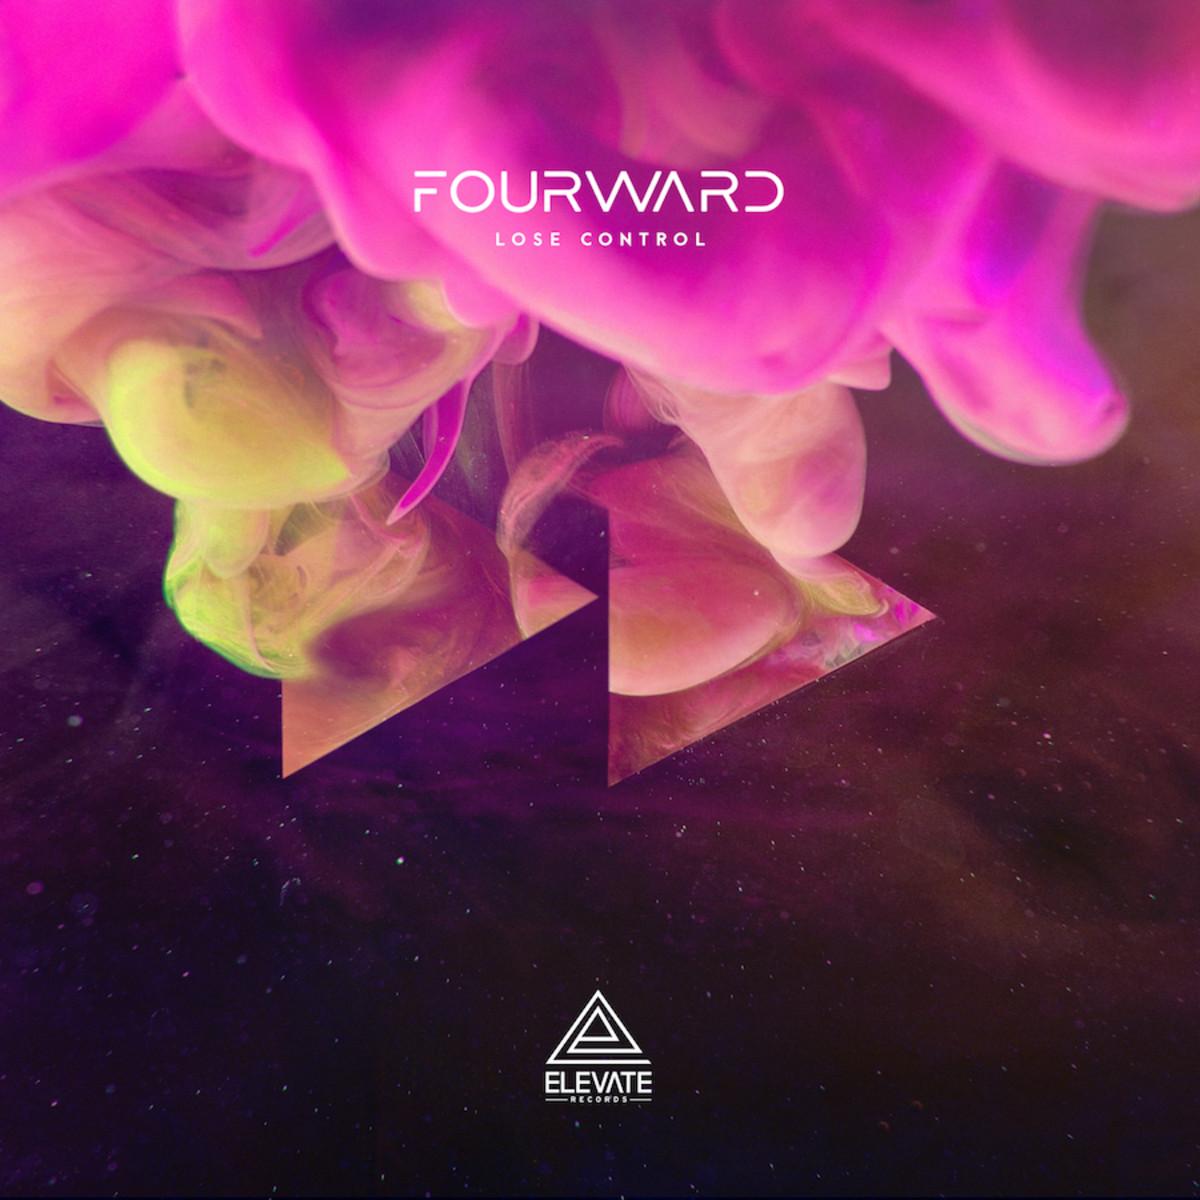 Forward - Lose Control [Elevate Records]